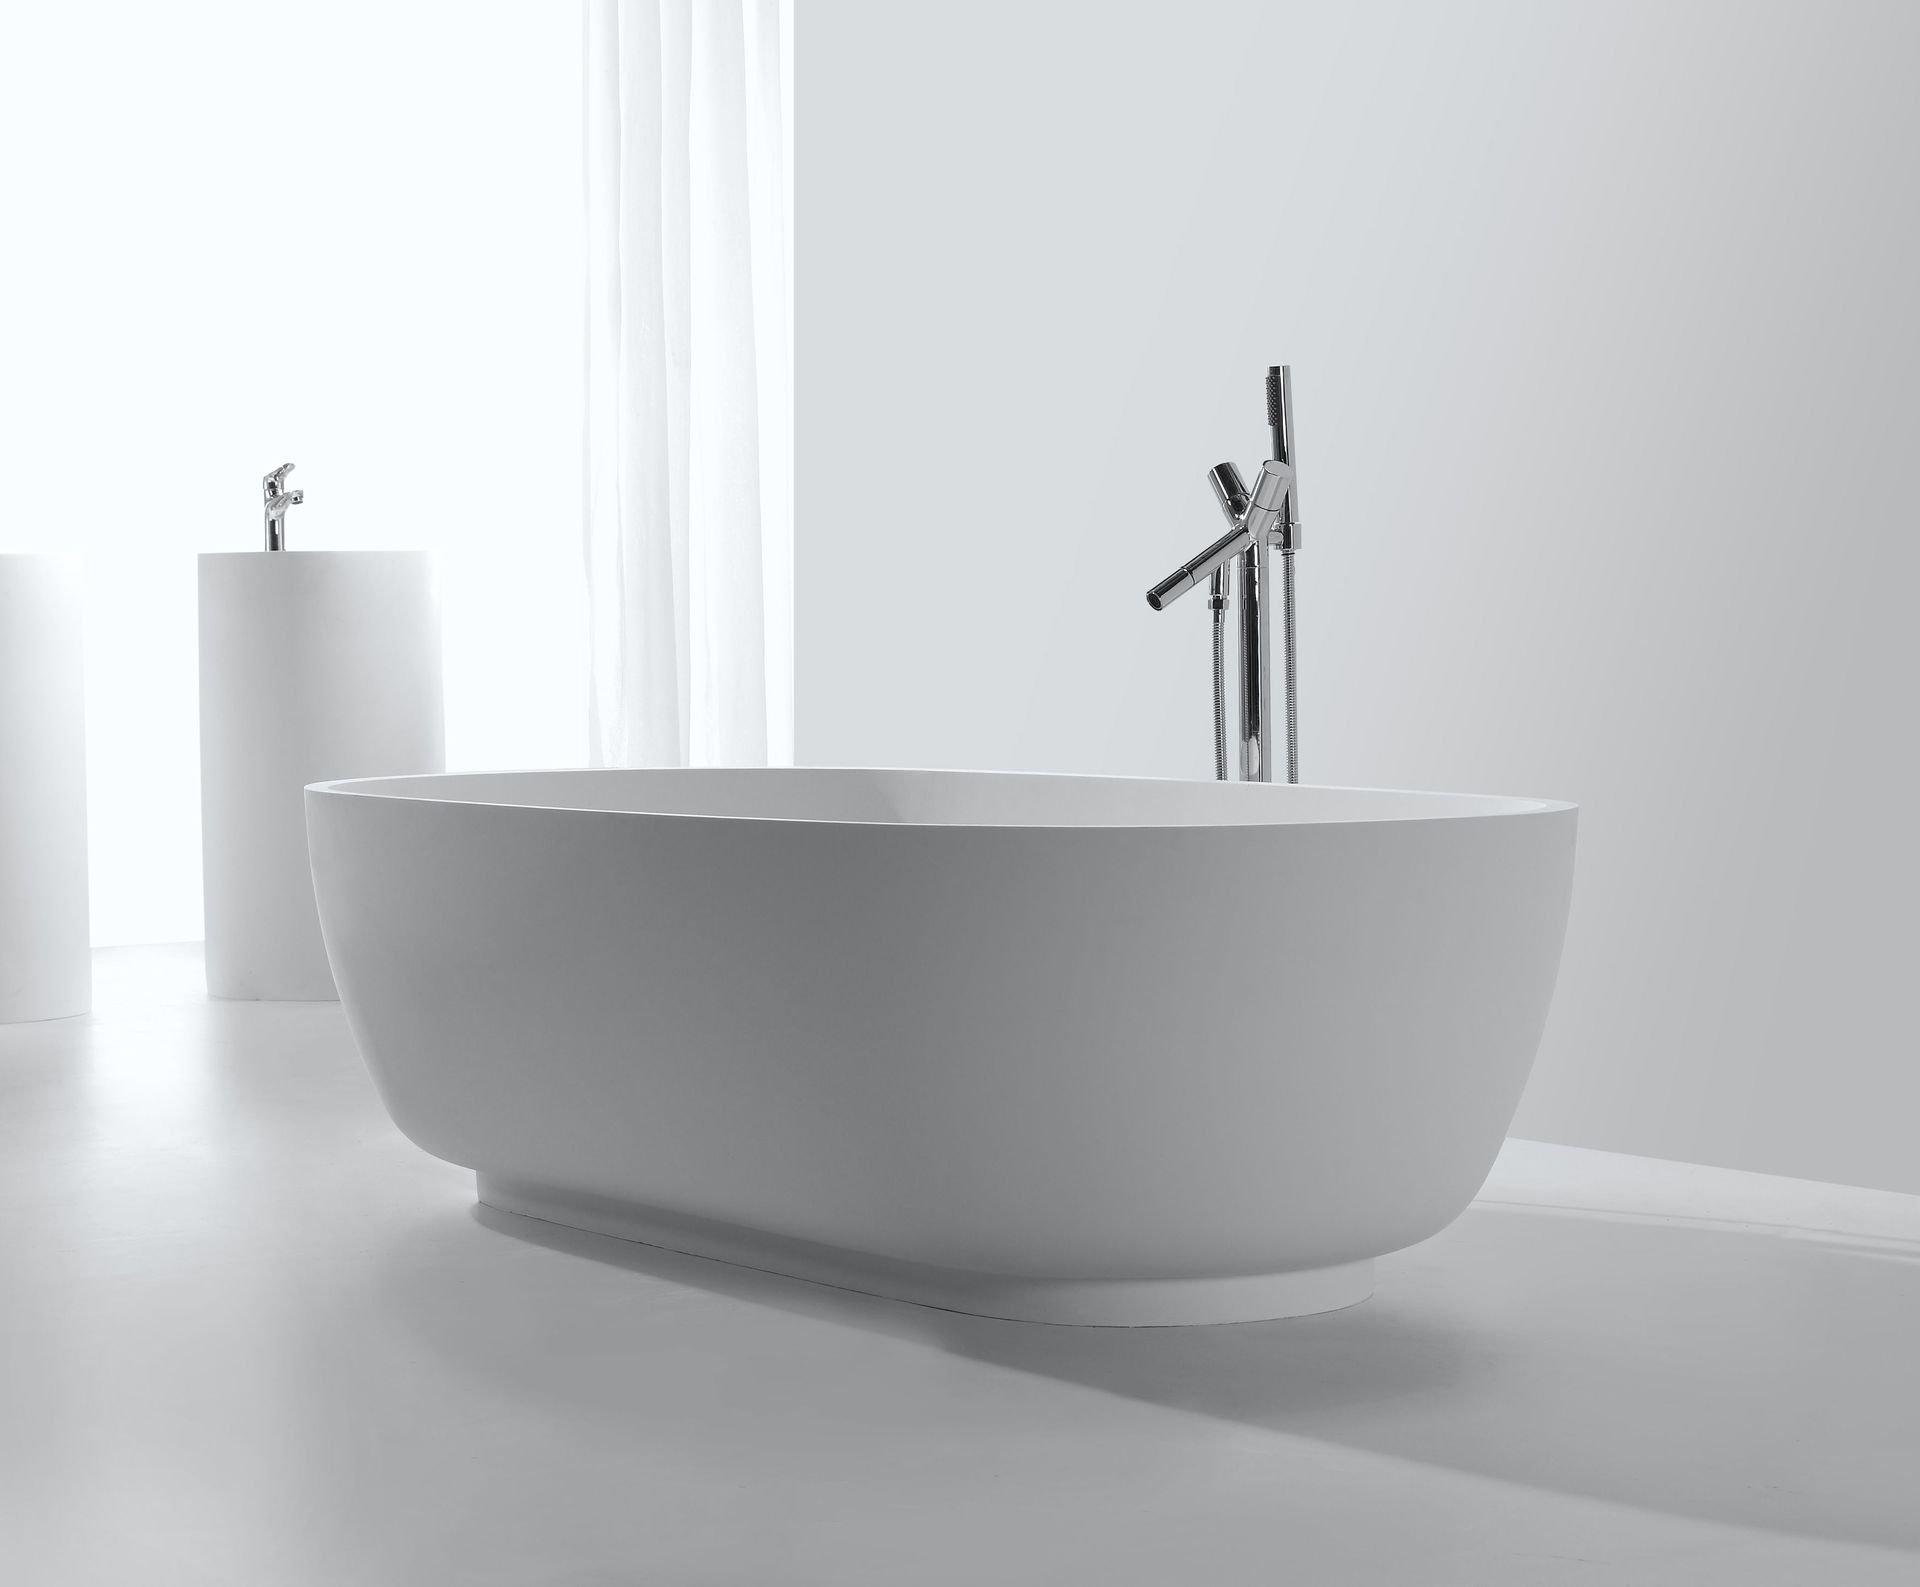 mineralguss badewanne affuso freistehend. Black Bedroom Furniture Sets. Home Design Ideas